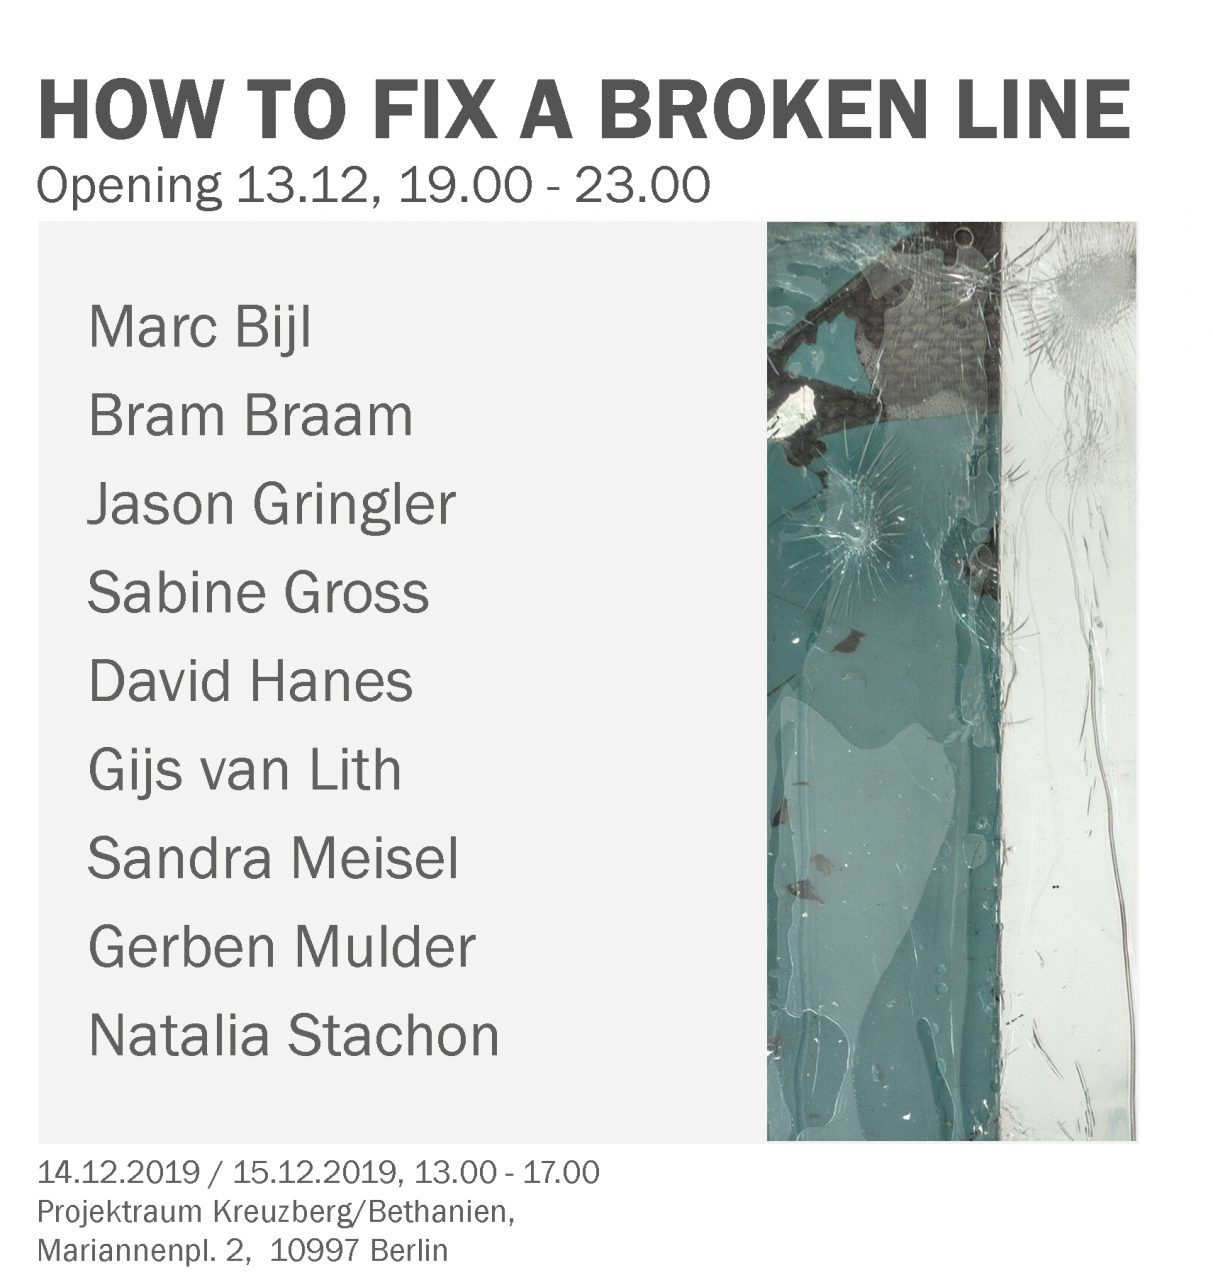 How to fix a broken line image